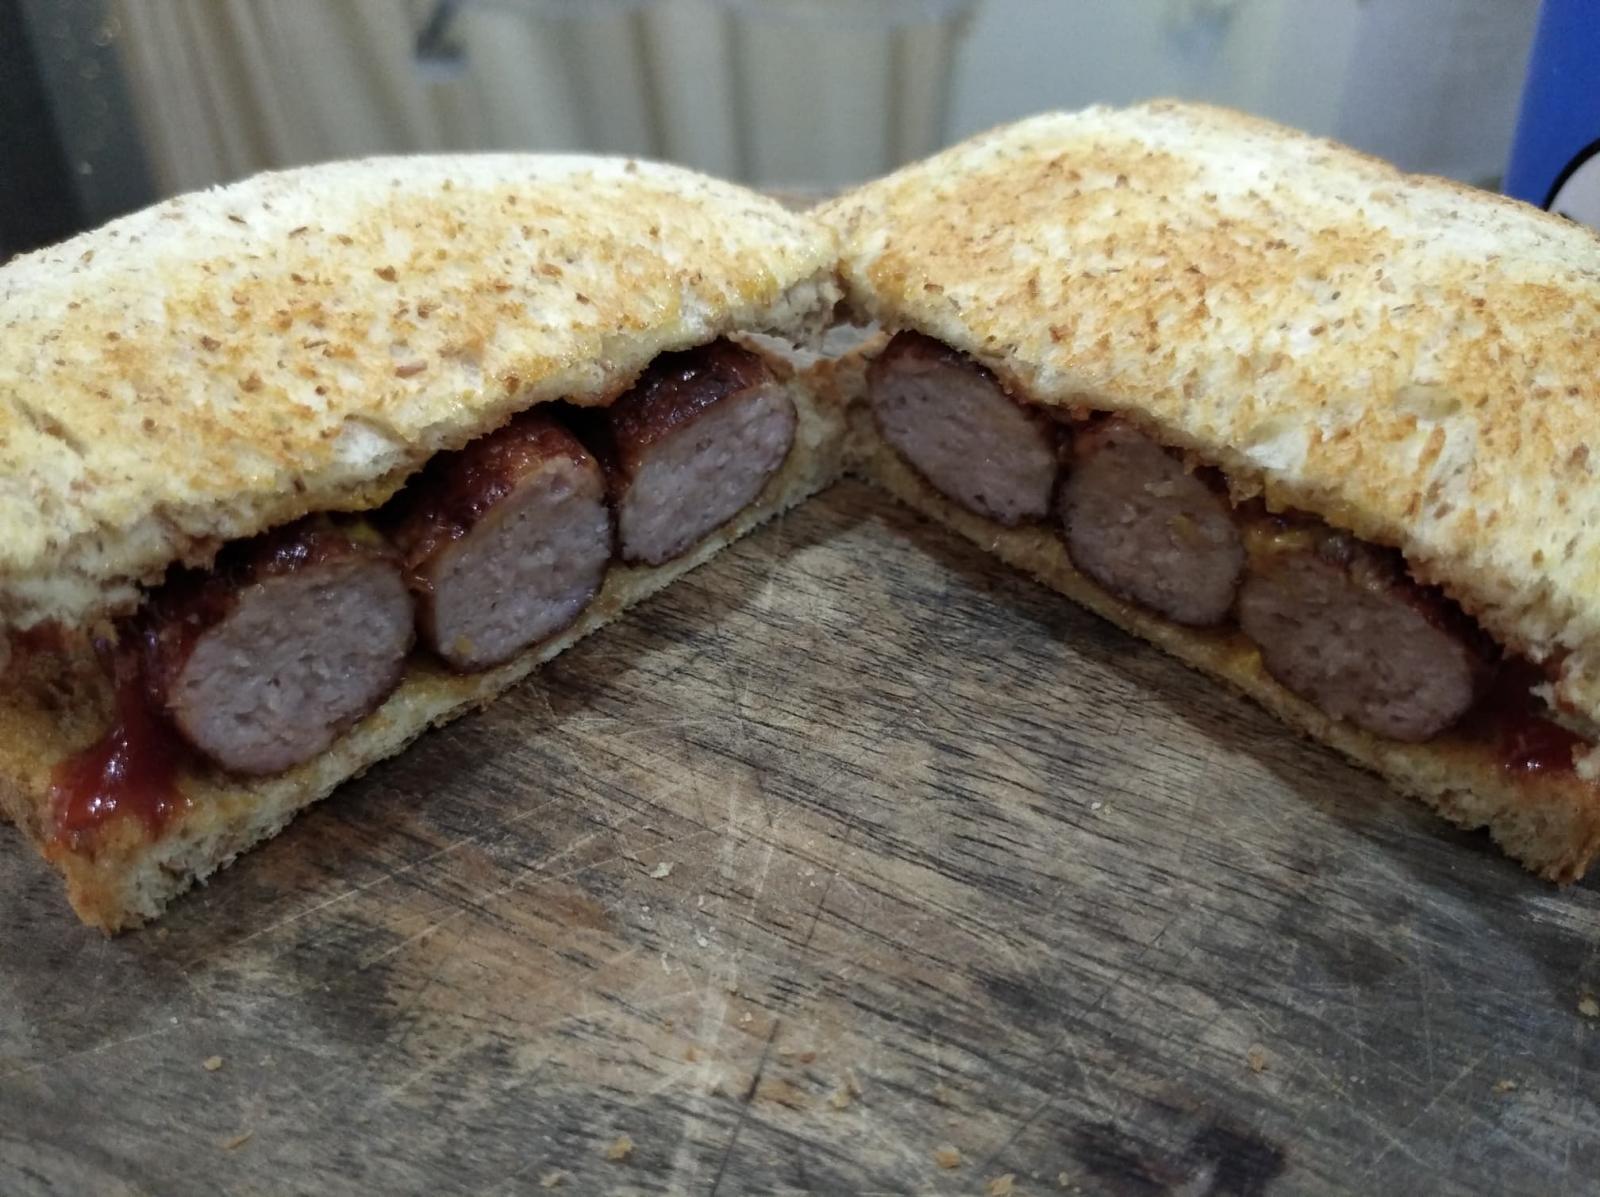 Manwiches-420-jpg